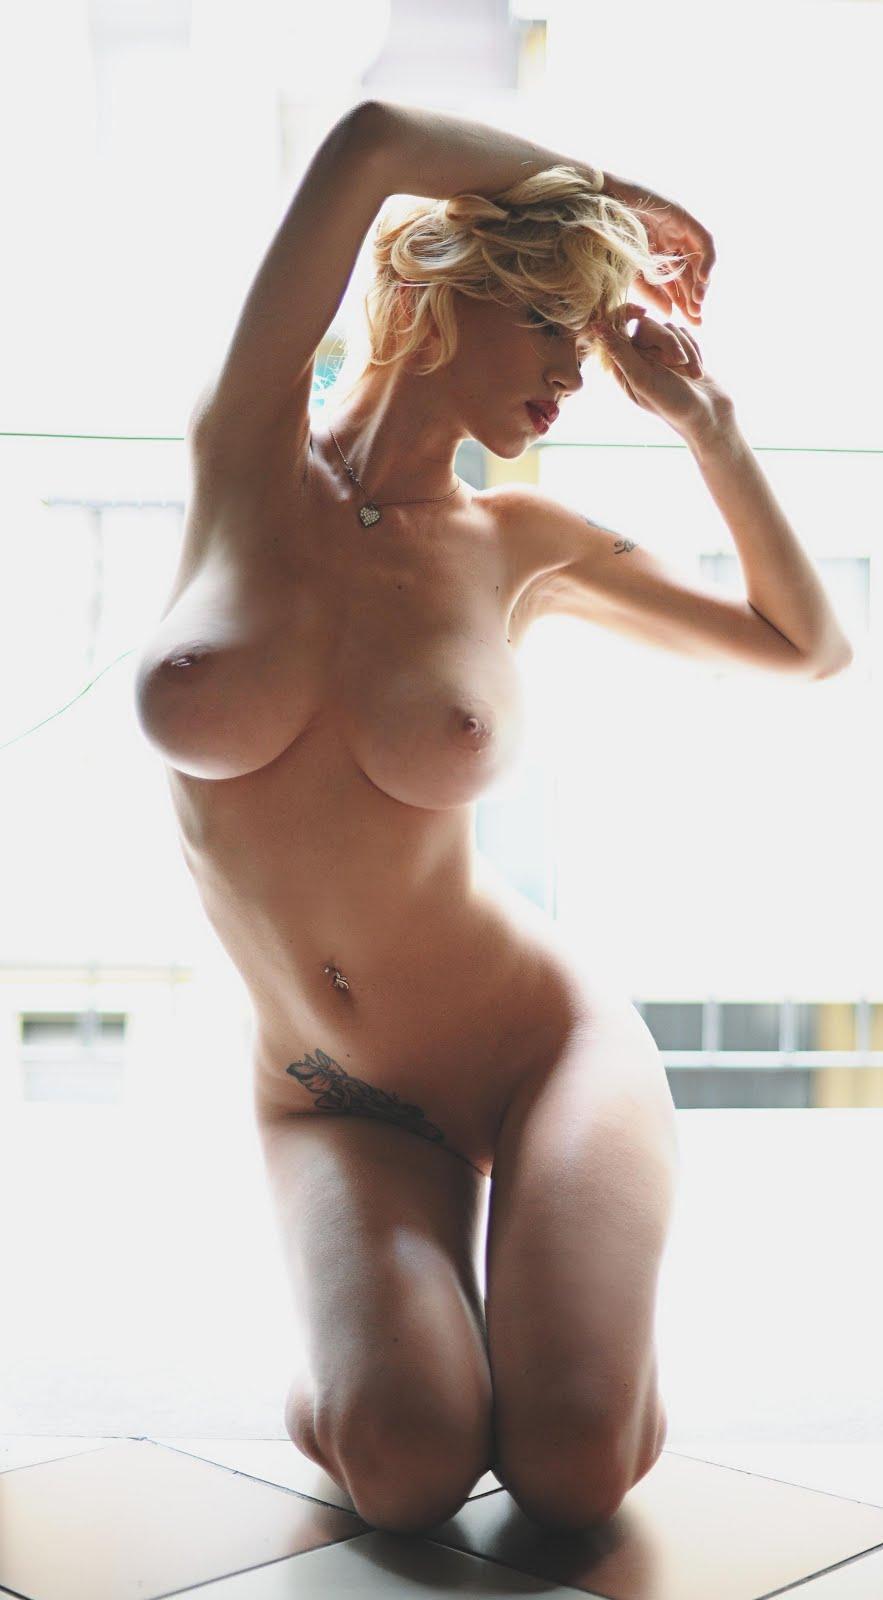 Yvonne strahovski sex in chuck series scandalplanet com